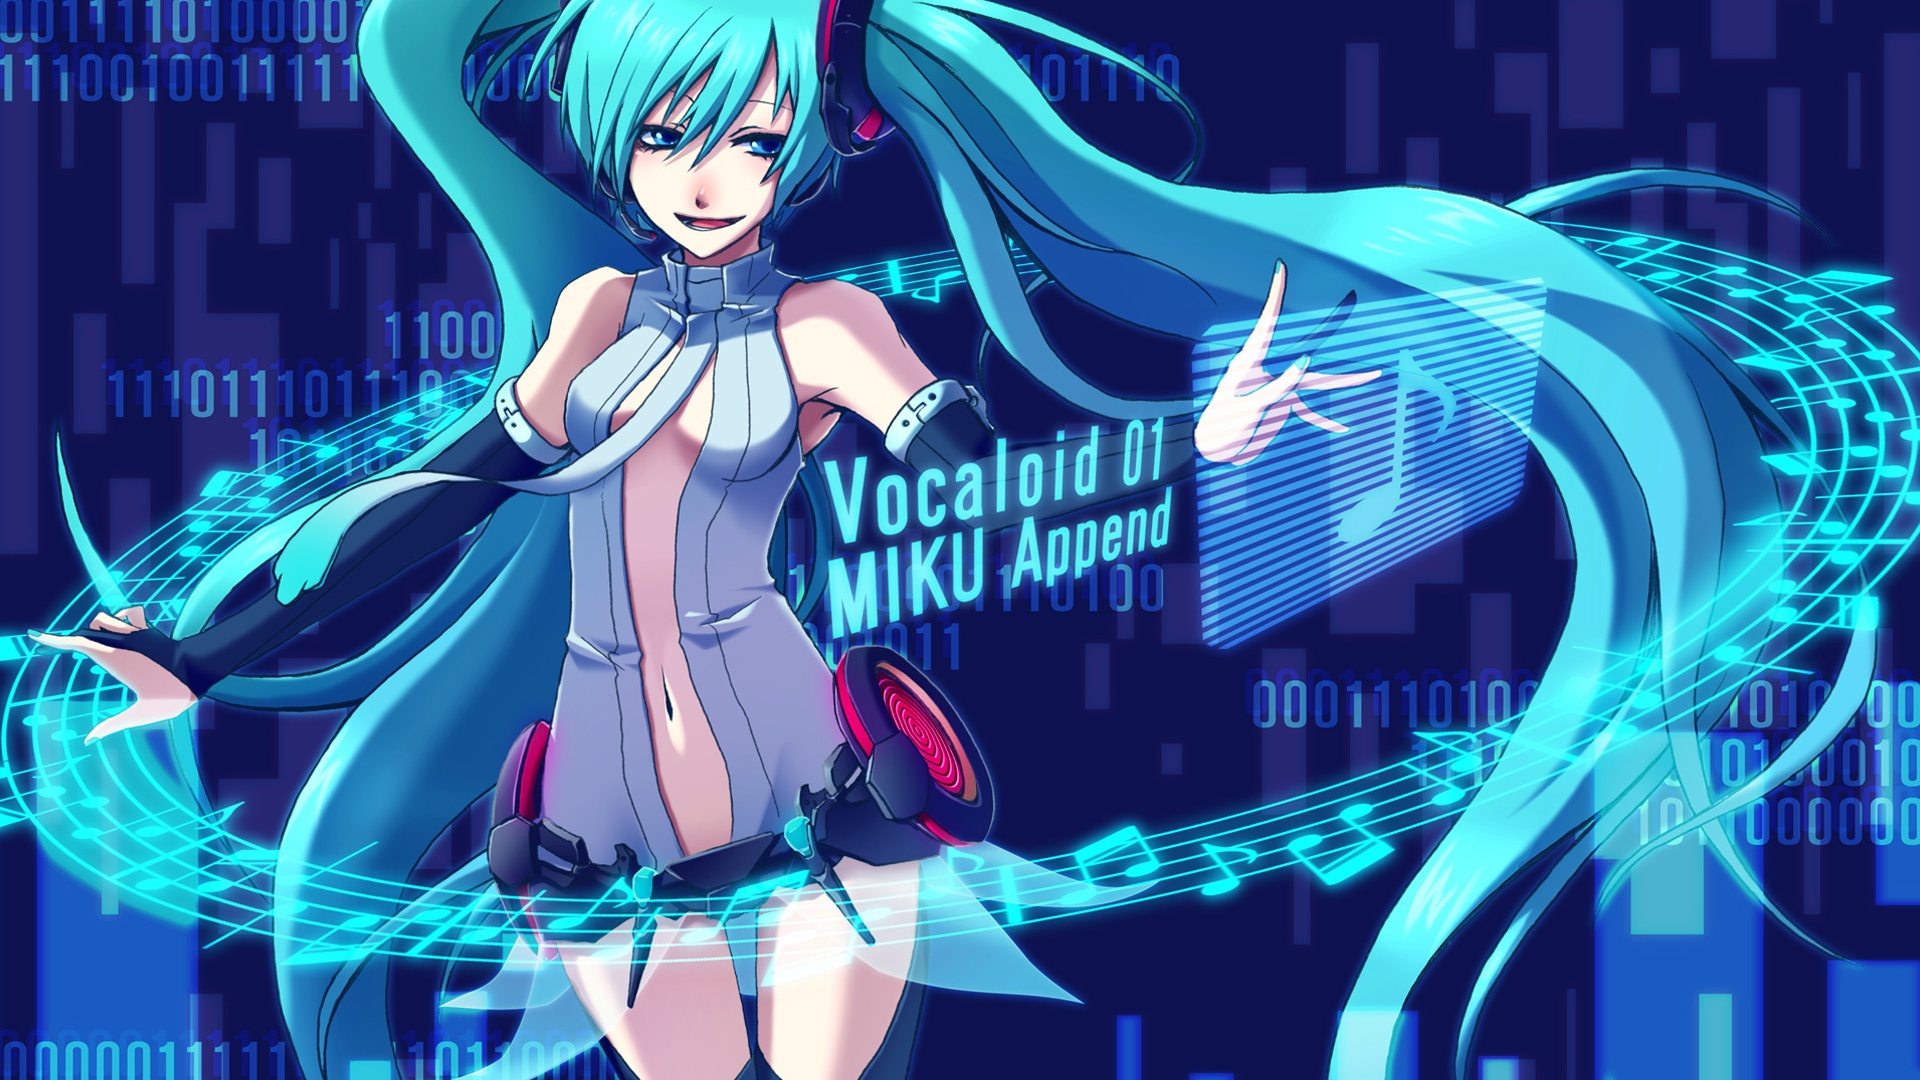 Wallpaper Hatsune Miku Music Blue Hair Anime Girl Miku Append